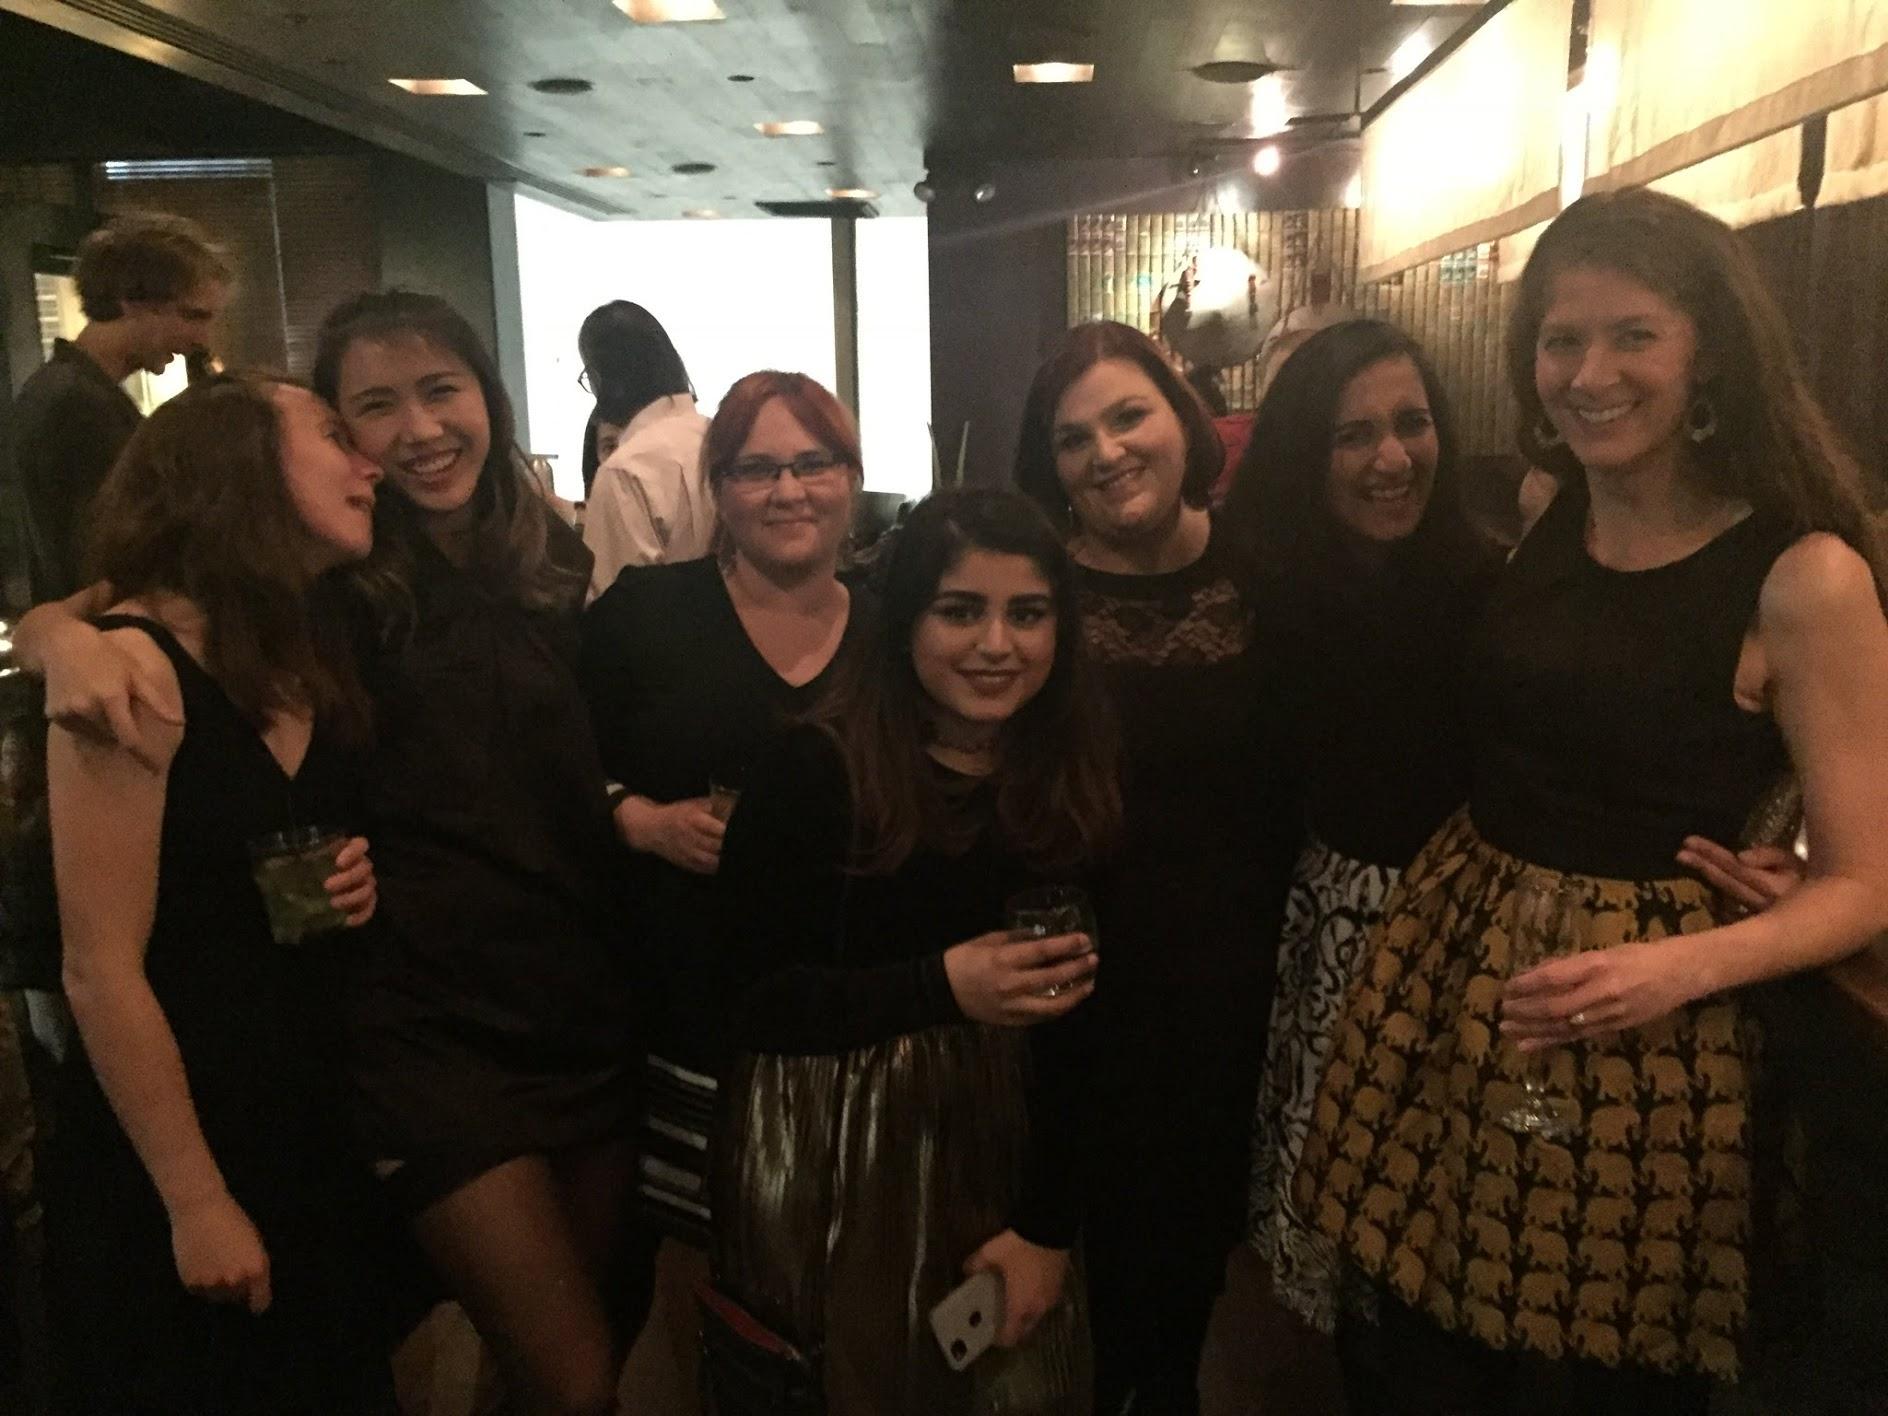 Feeling the holiday cheer  (left to right) Tanya Schild, Vivien Low, Didem Ilter, Tasnia Islam, Ana Gomes, Kripa Ganesh, Bethany Shaffer  December 2017